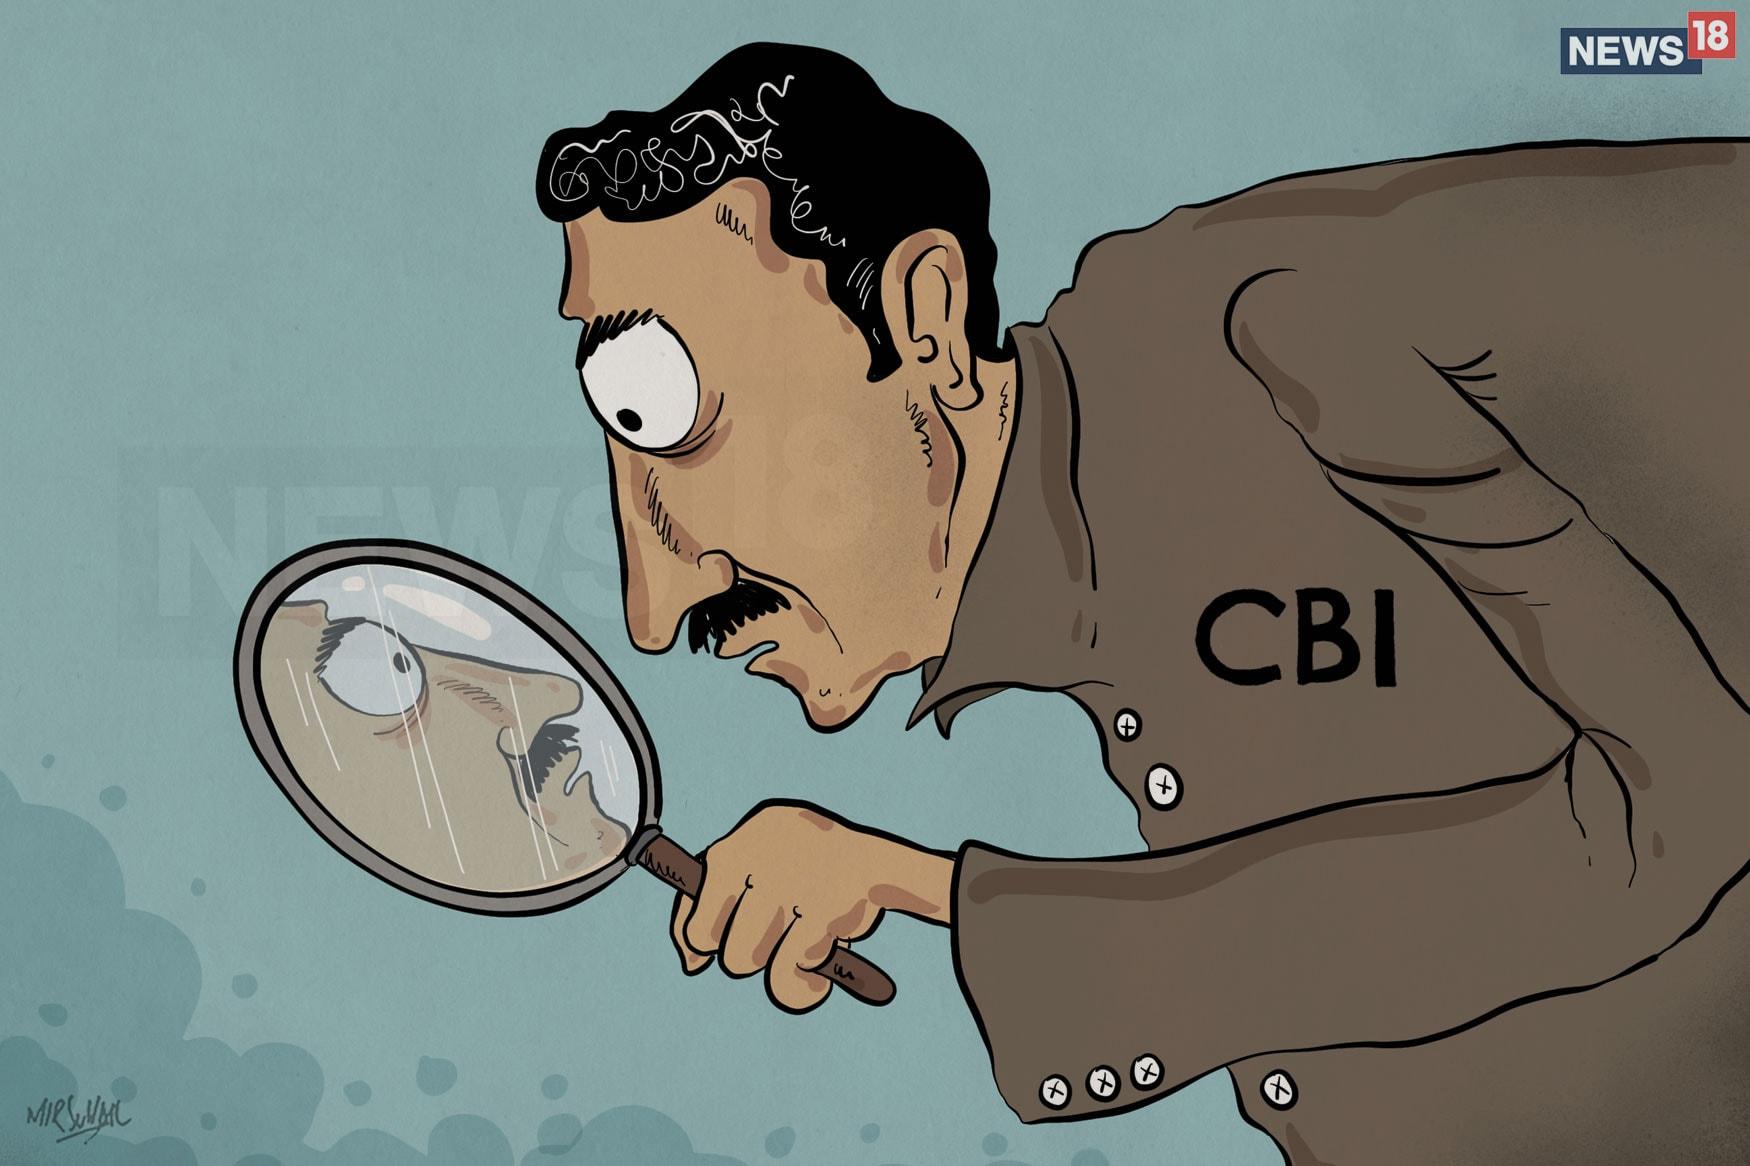 Illustration by Mir Suhail/News18